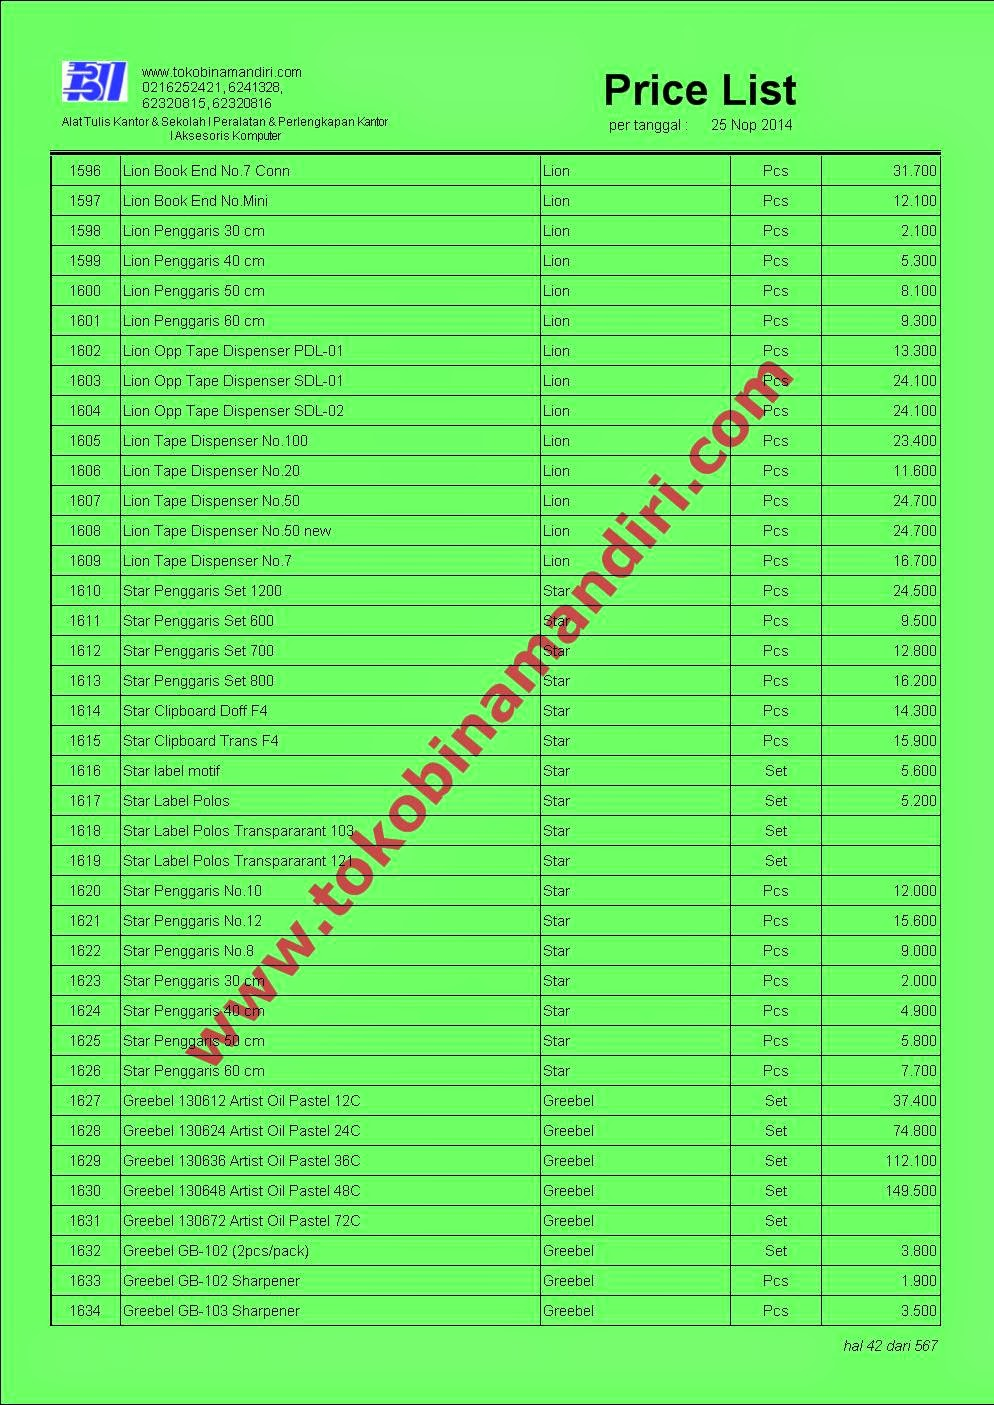 Daftar Harga Stationery ATK Kantor di www.alattulis.co.id